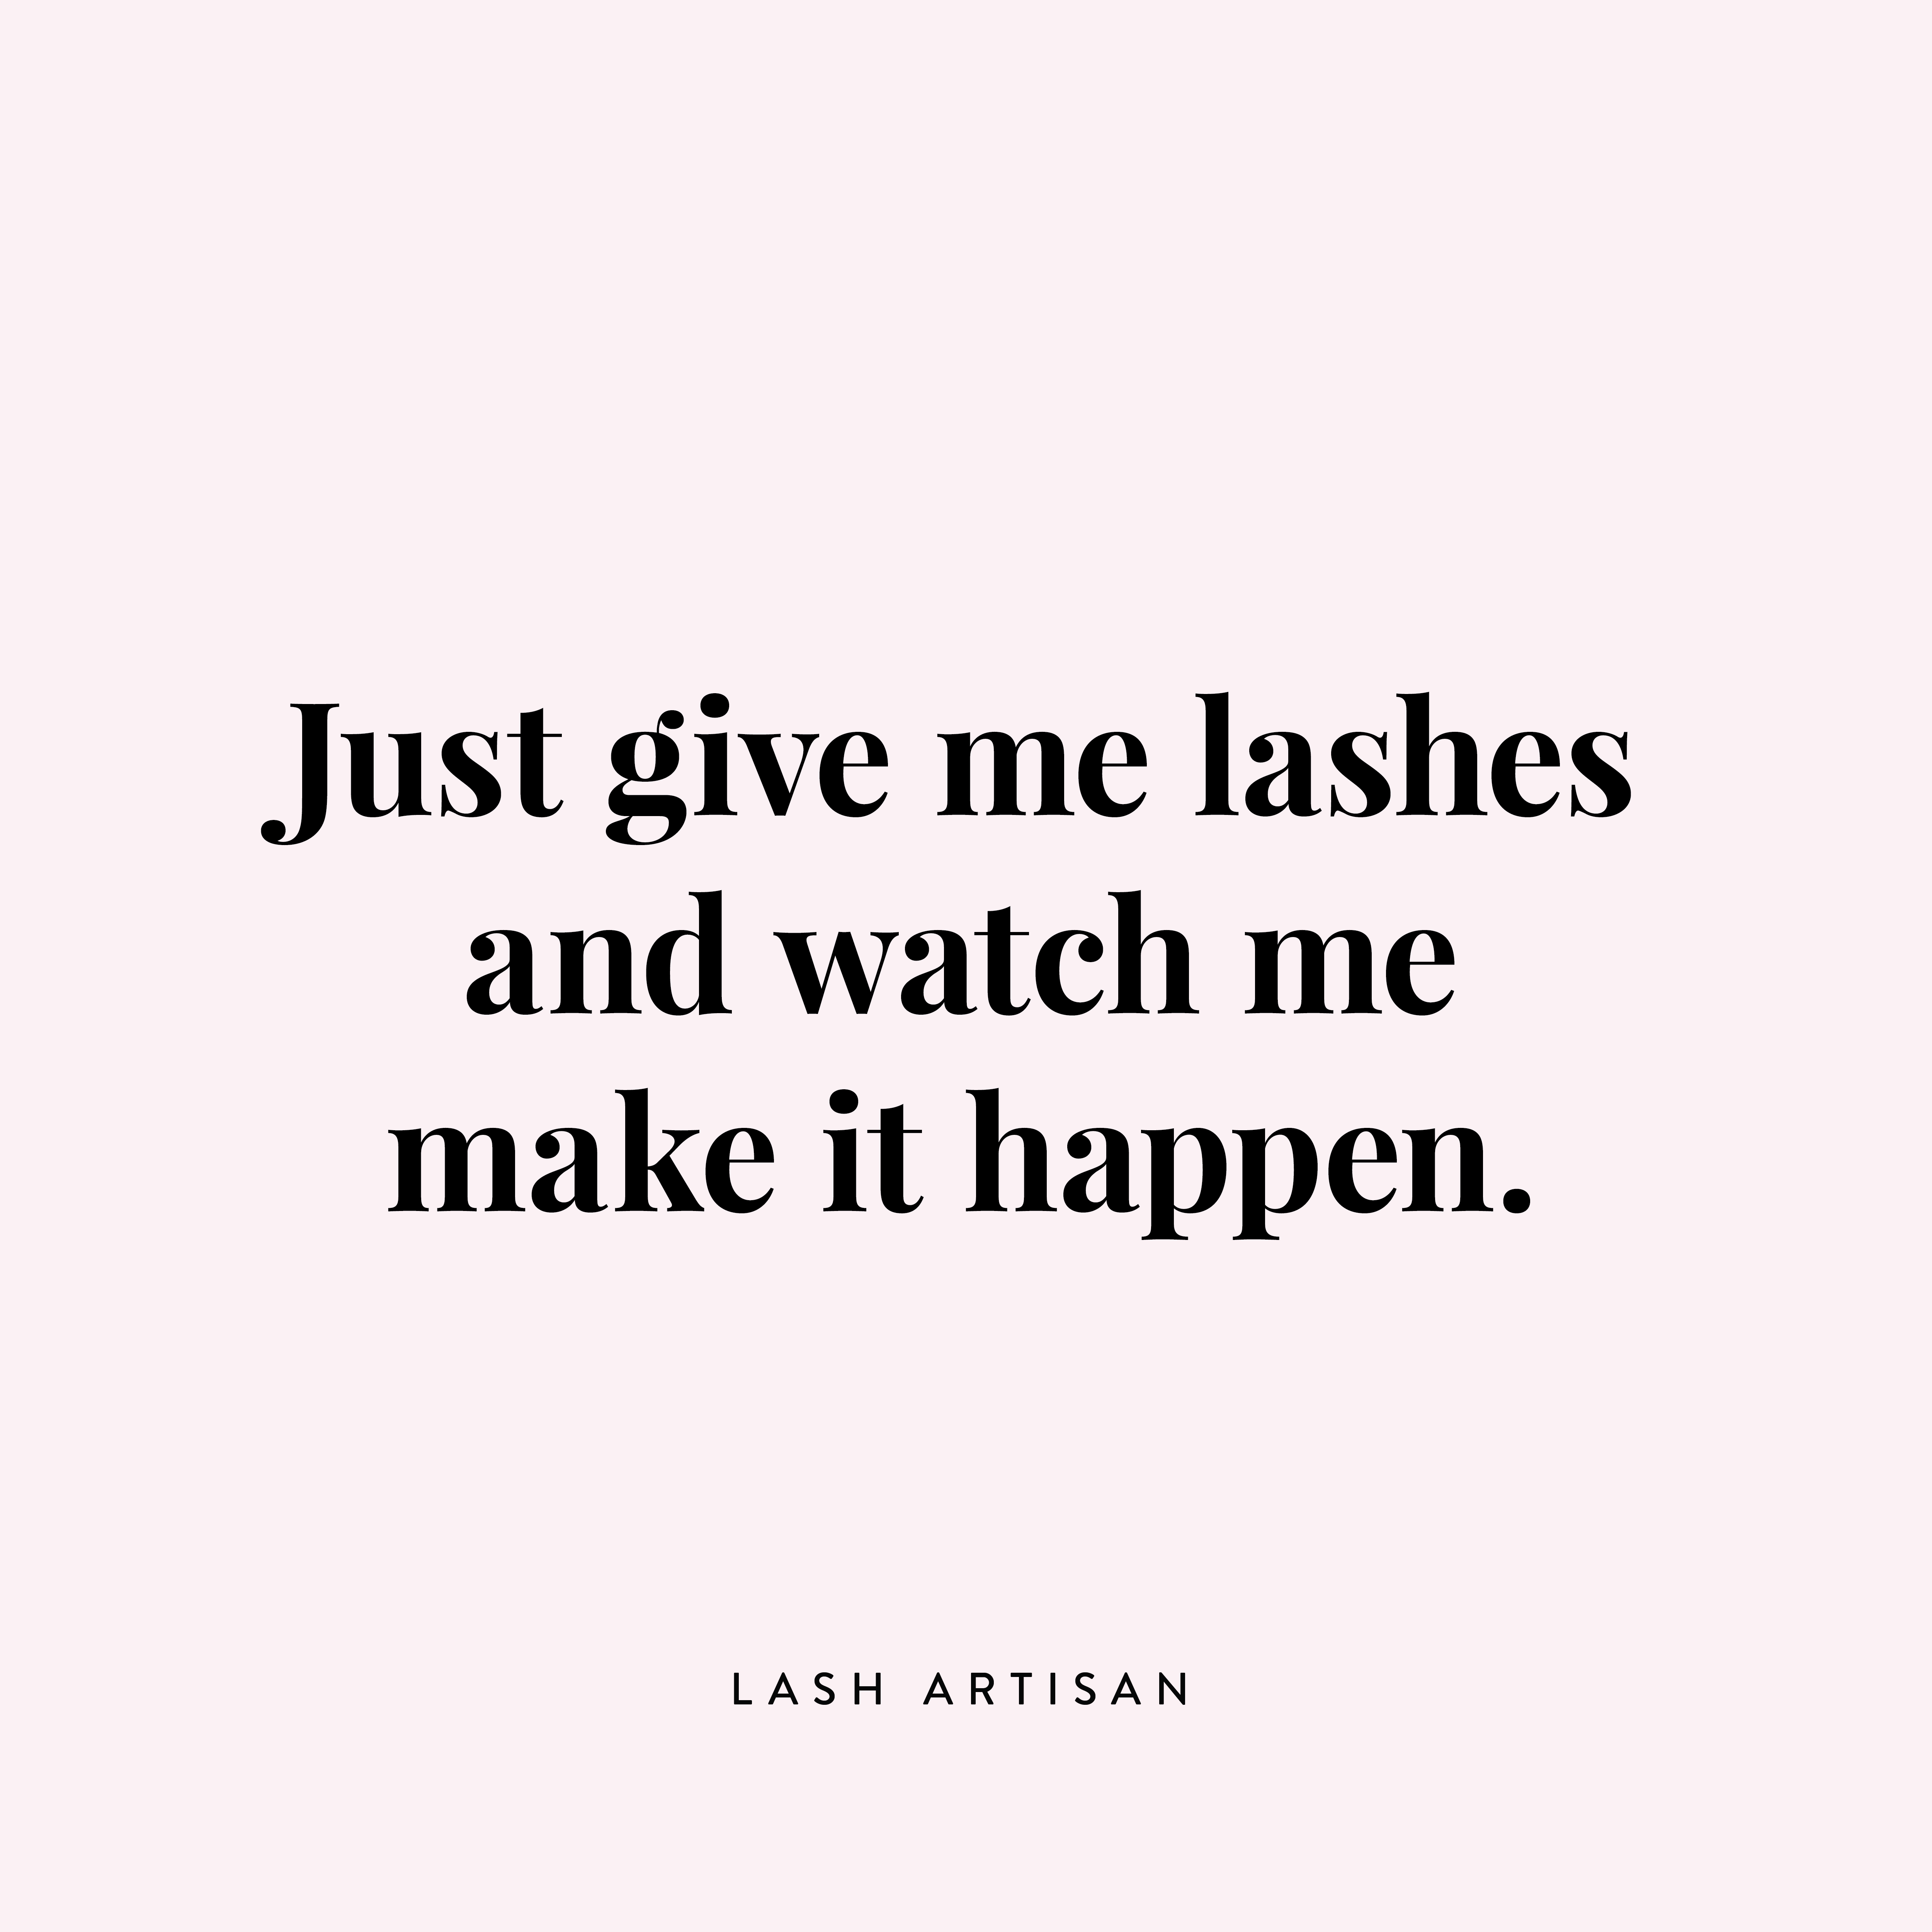 lashquotes motivation lashlove lashboss lashes quotes